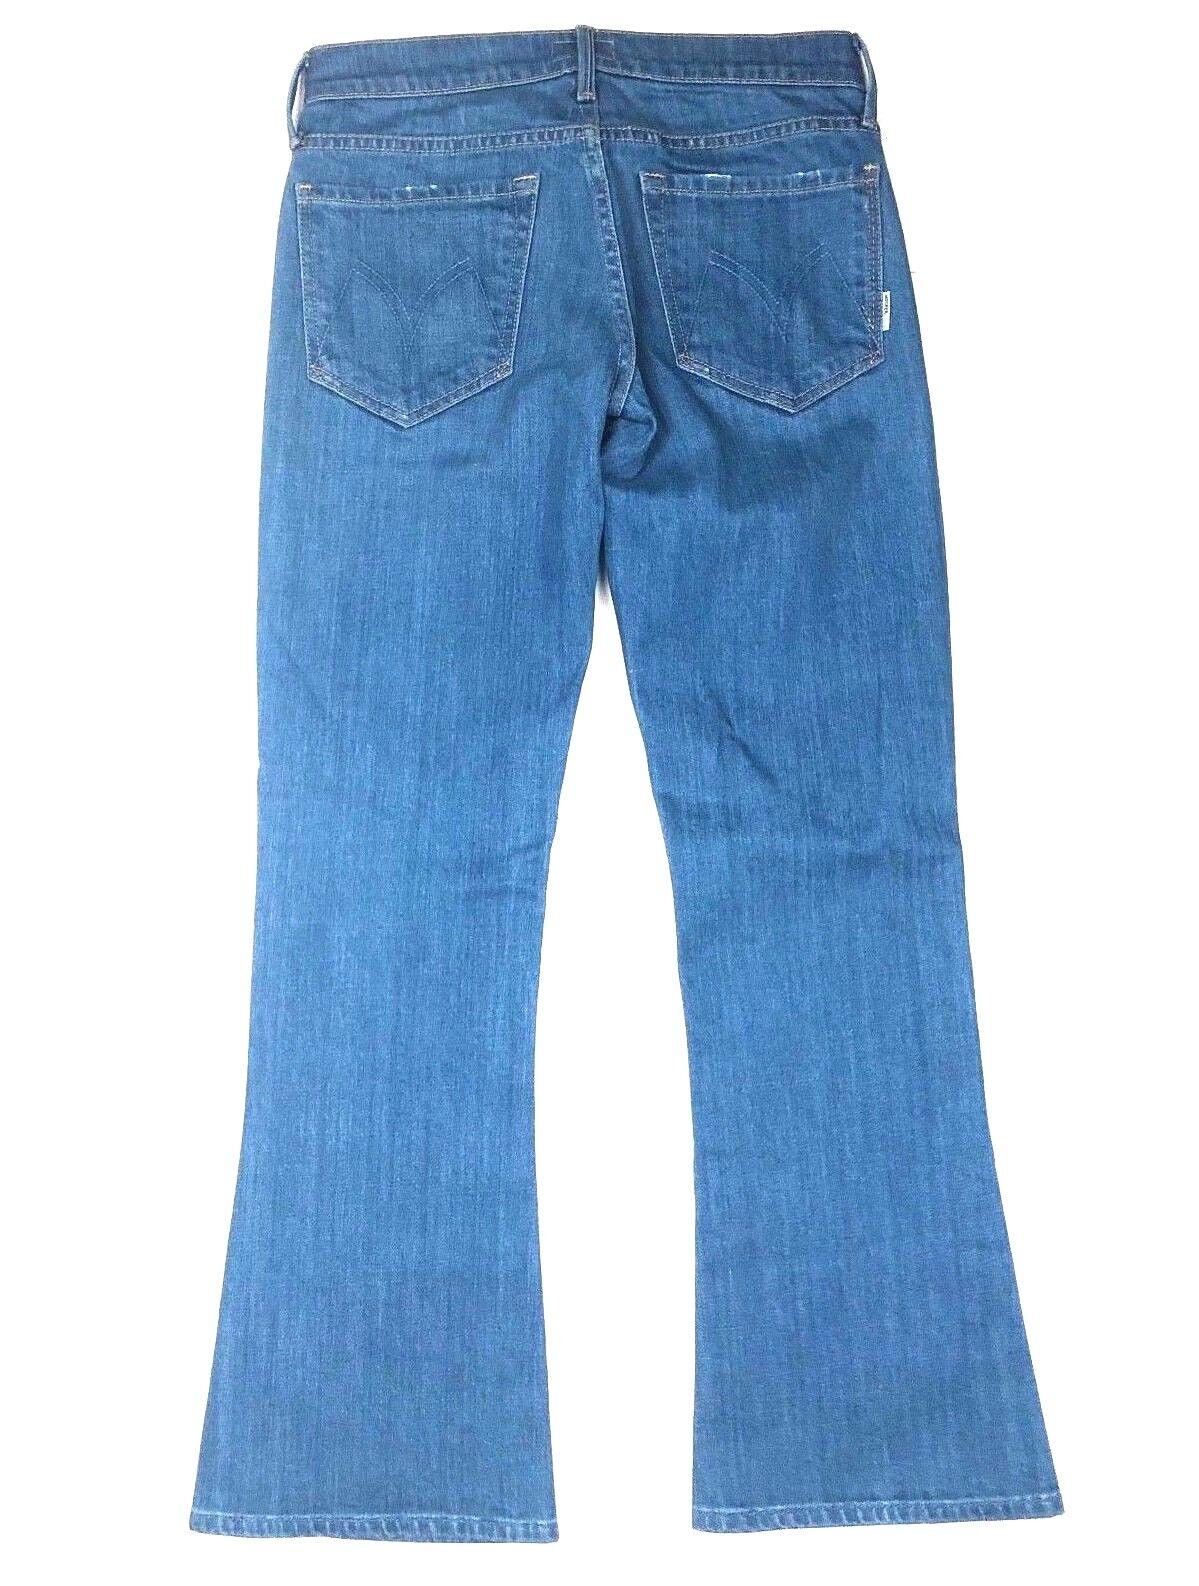 MOTHER Denim Bootcut Flare Crop Capri Ankle 1 2 Women's Jean Pants